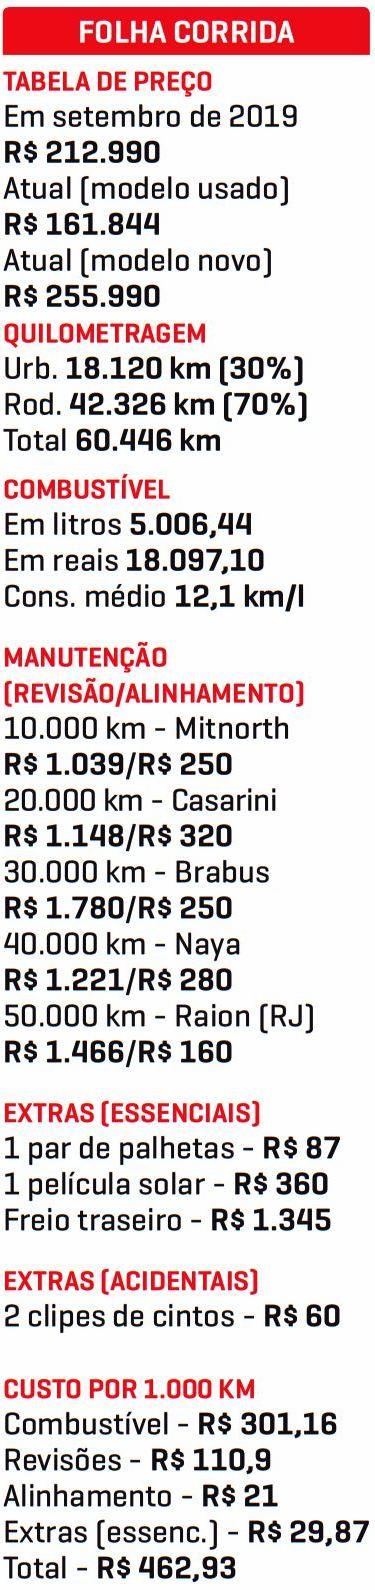 folha-corrida-mitsubishi-outlander.jpg